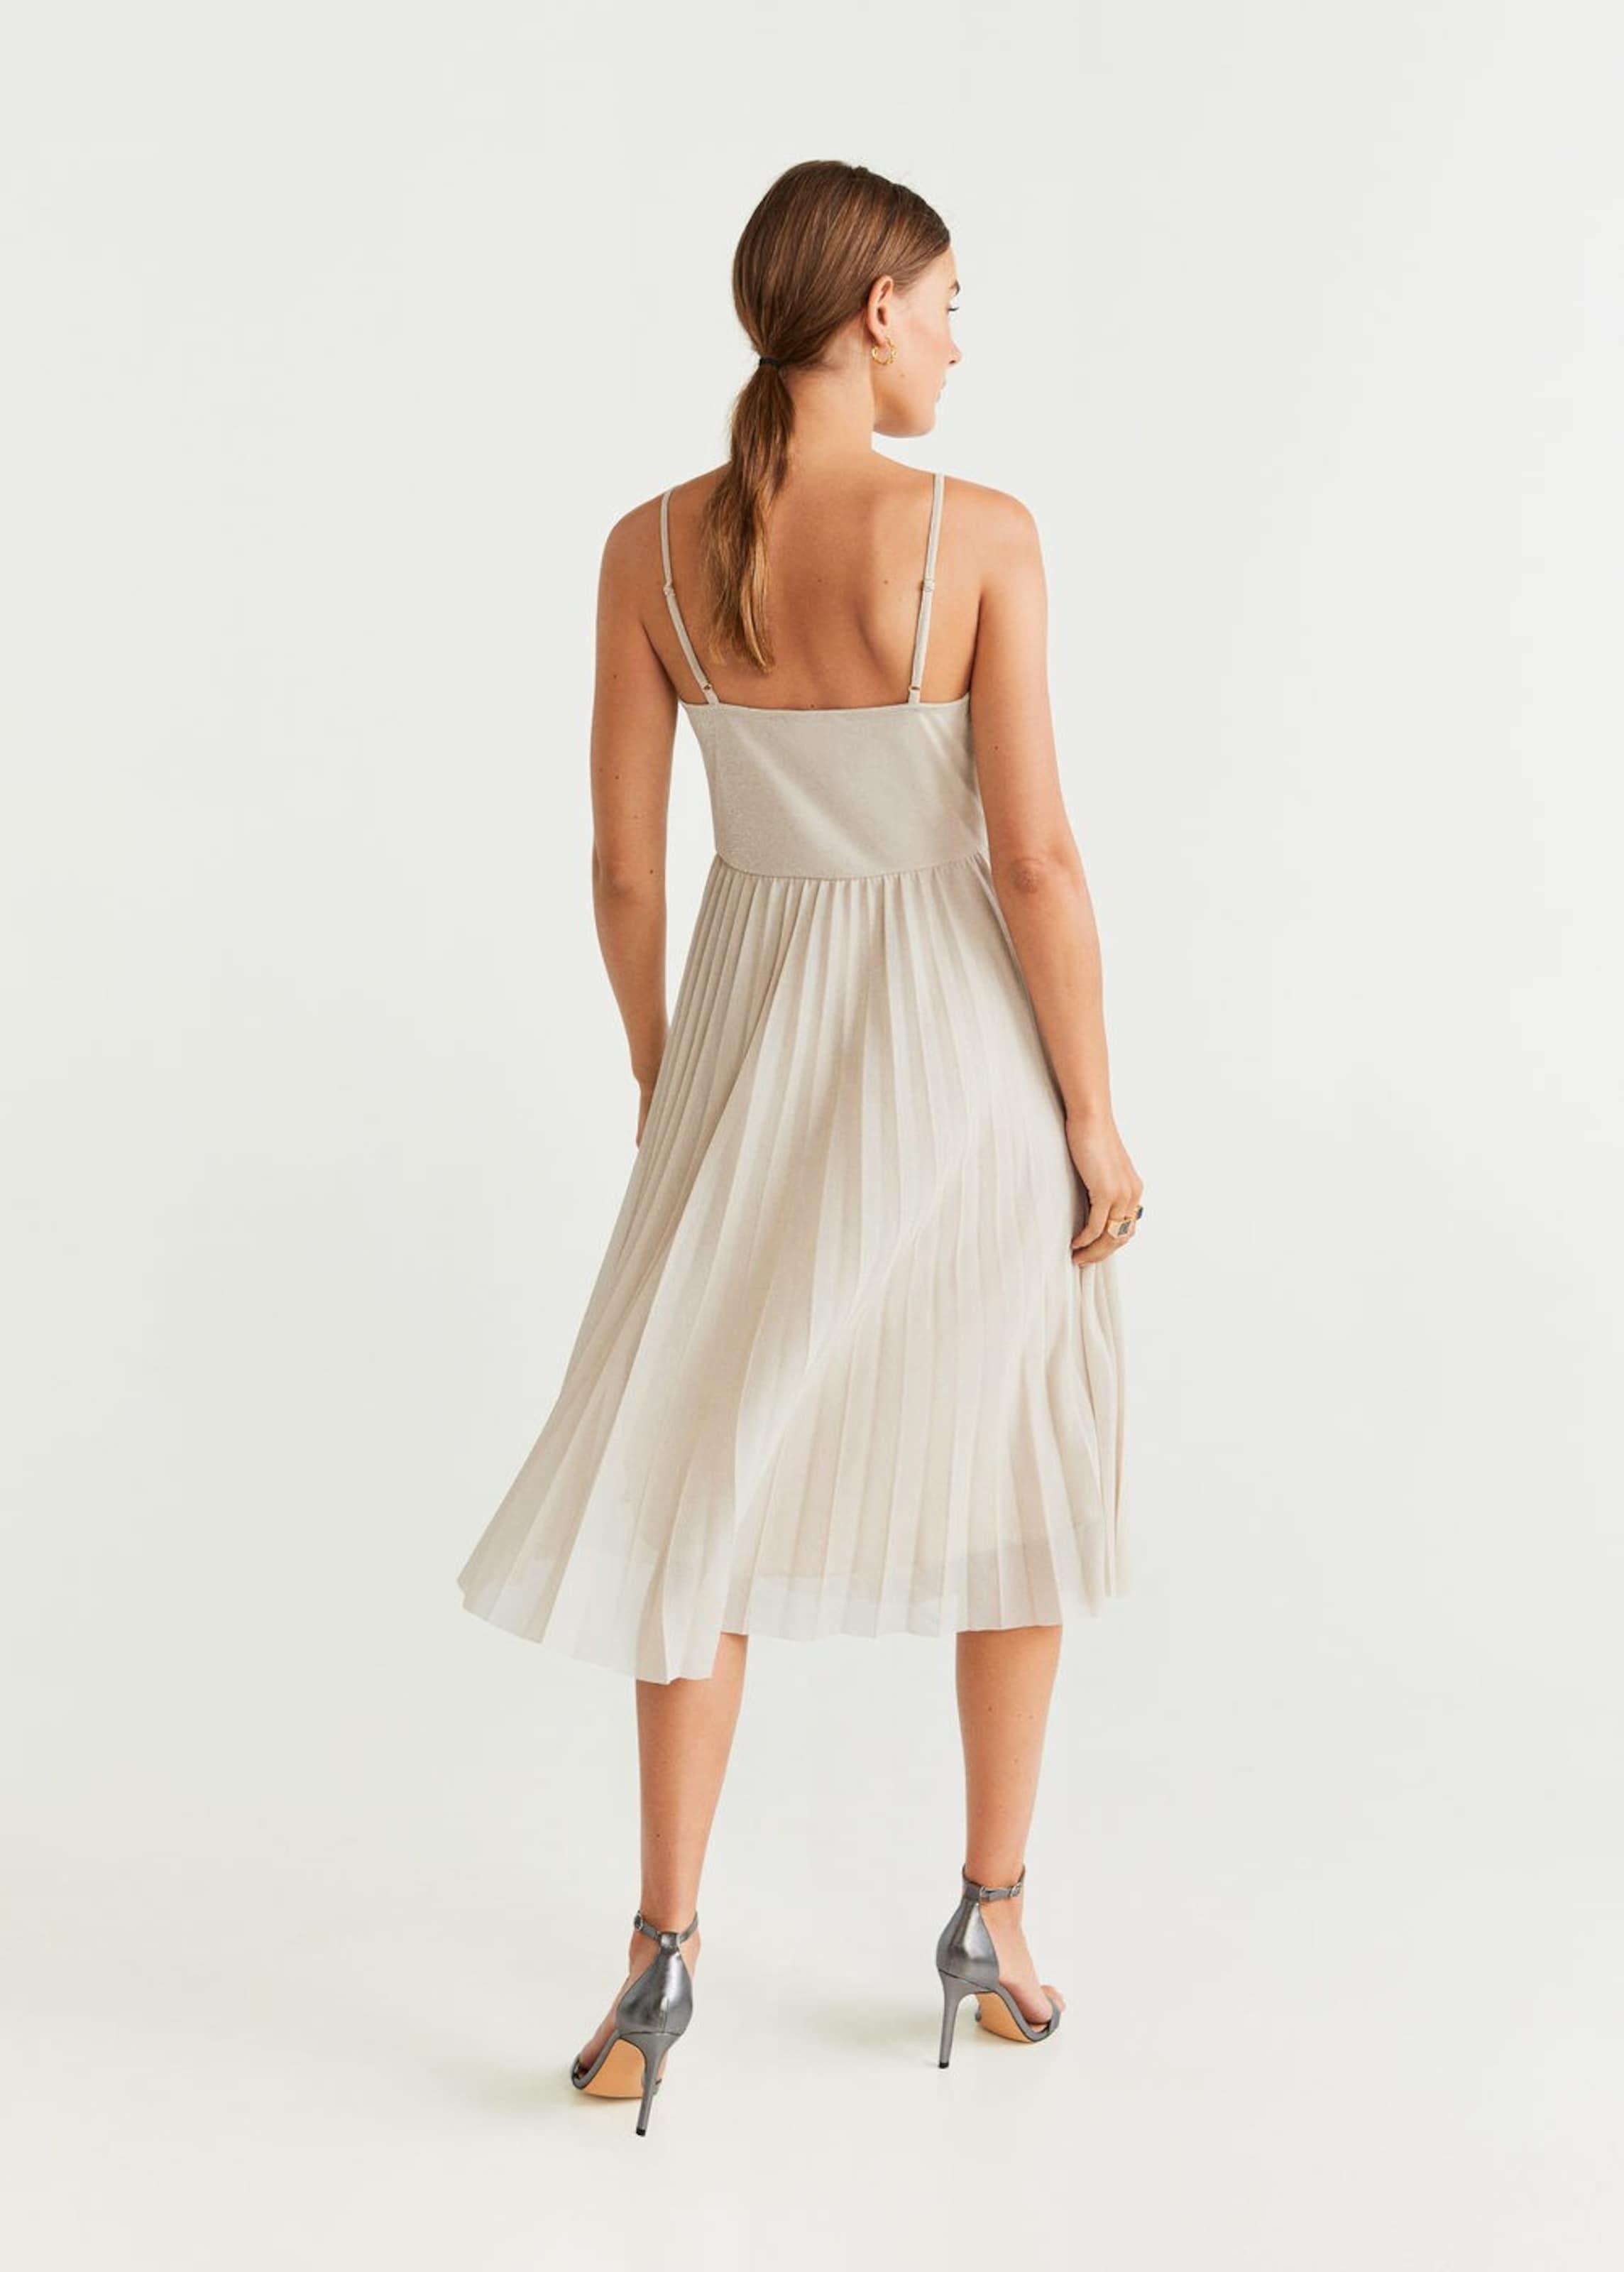 'lurik Kleid Beige In Mango x' j4RLq35A